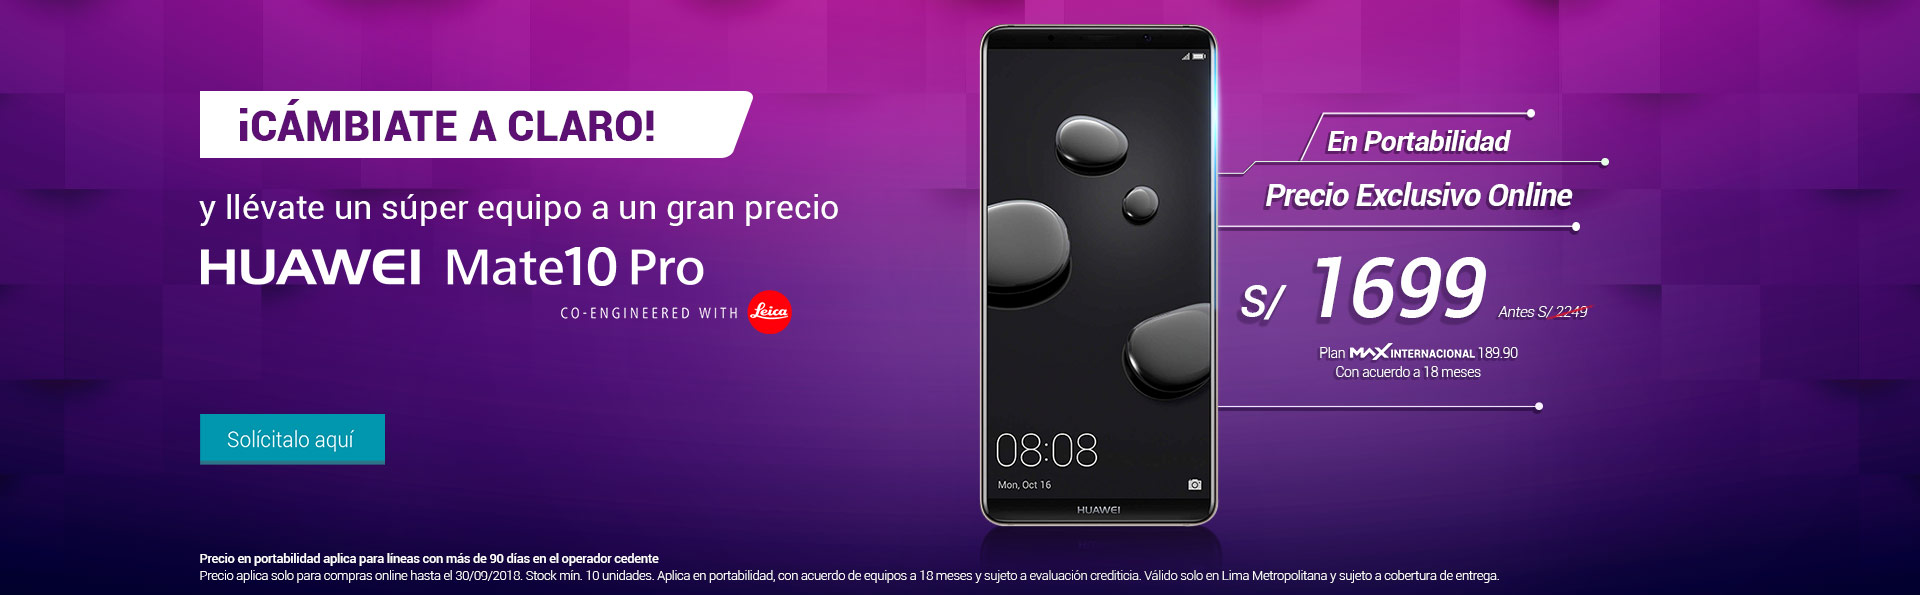 HuaweiMate10Pro_PrecioExclusivoOnline_050918